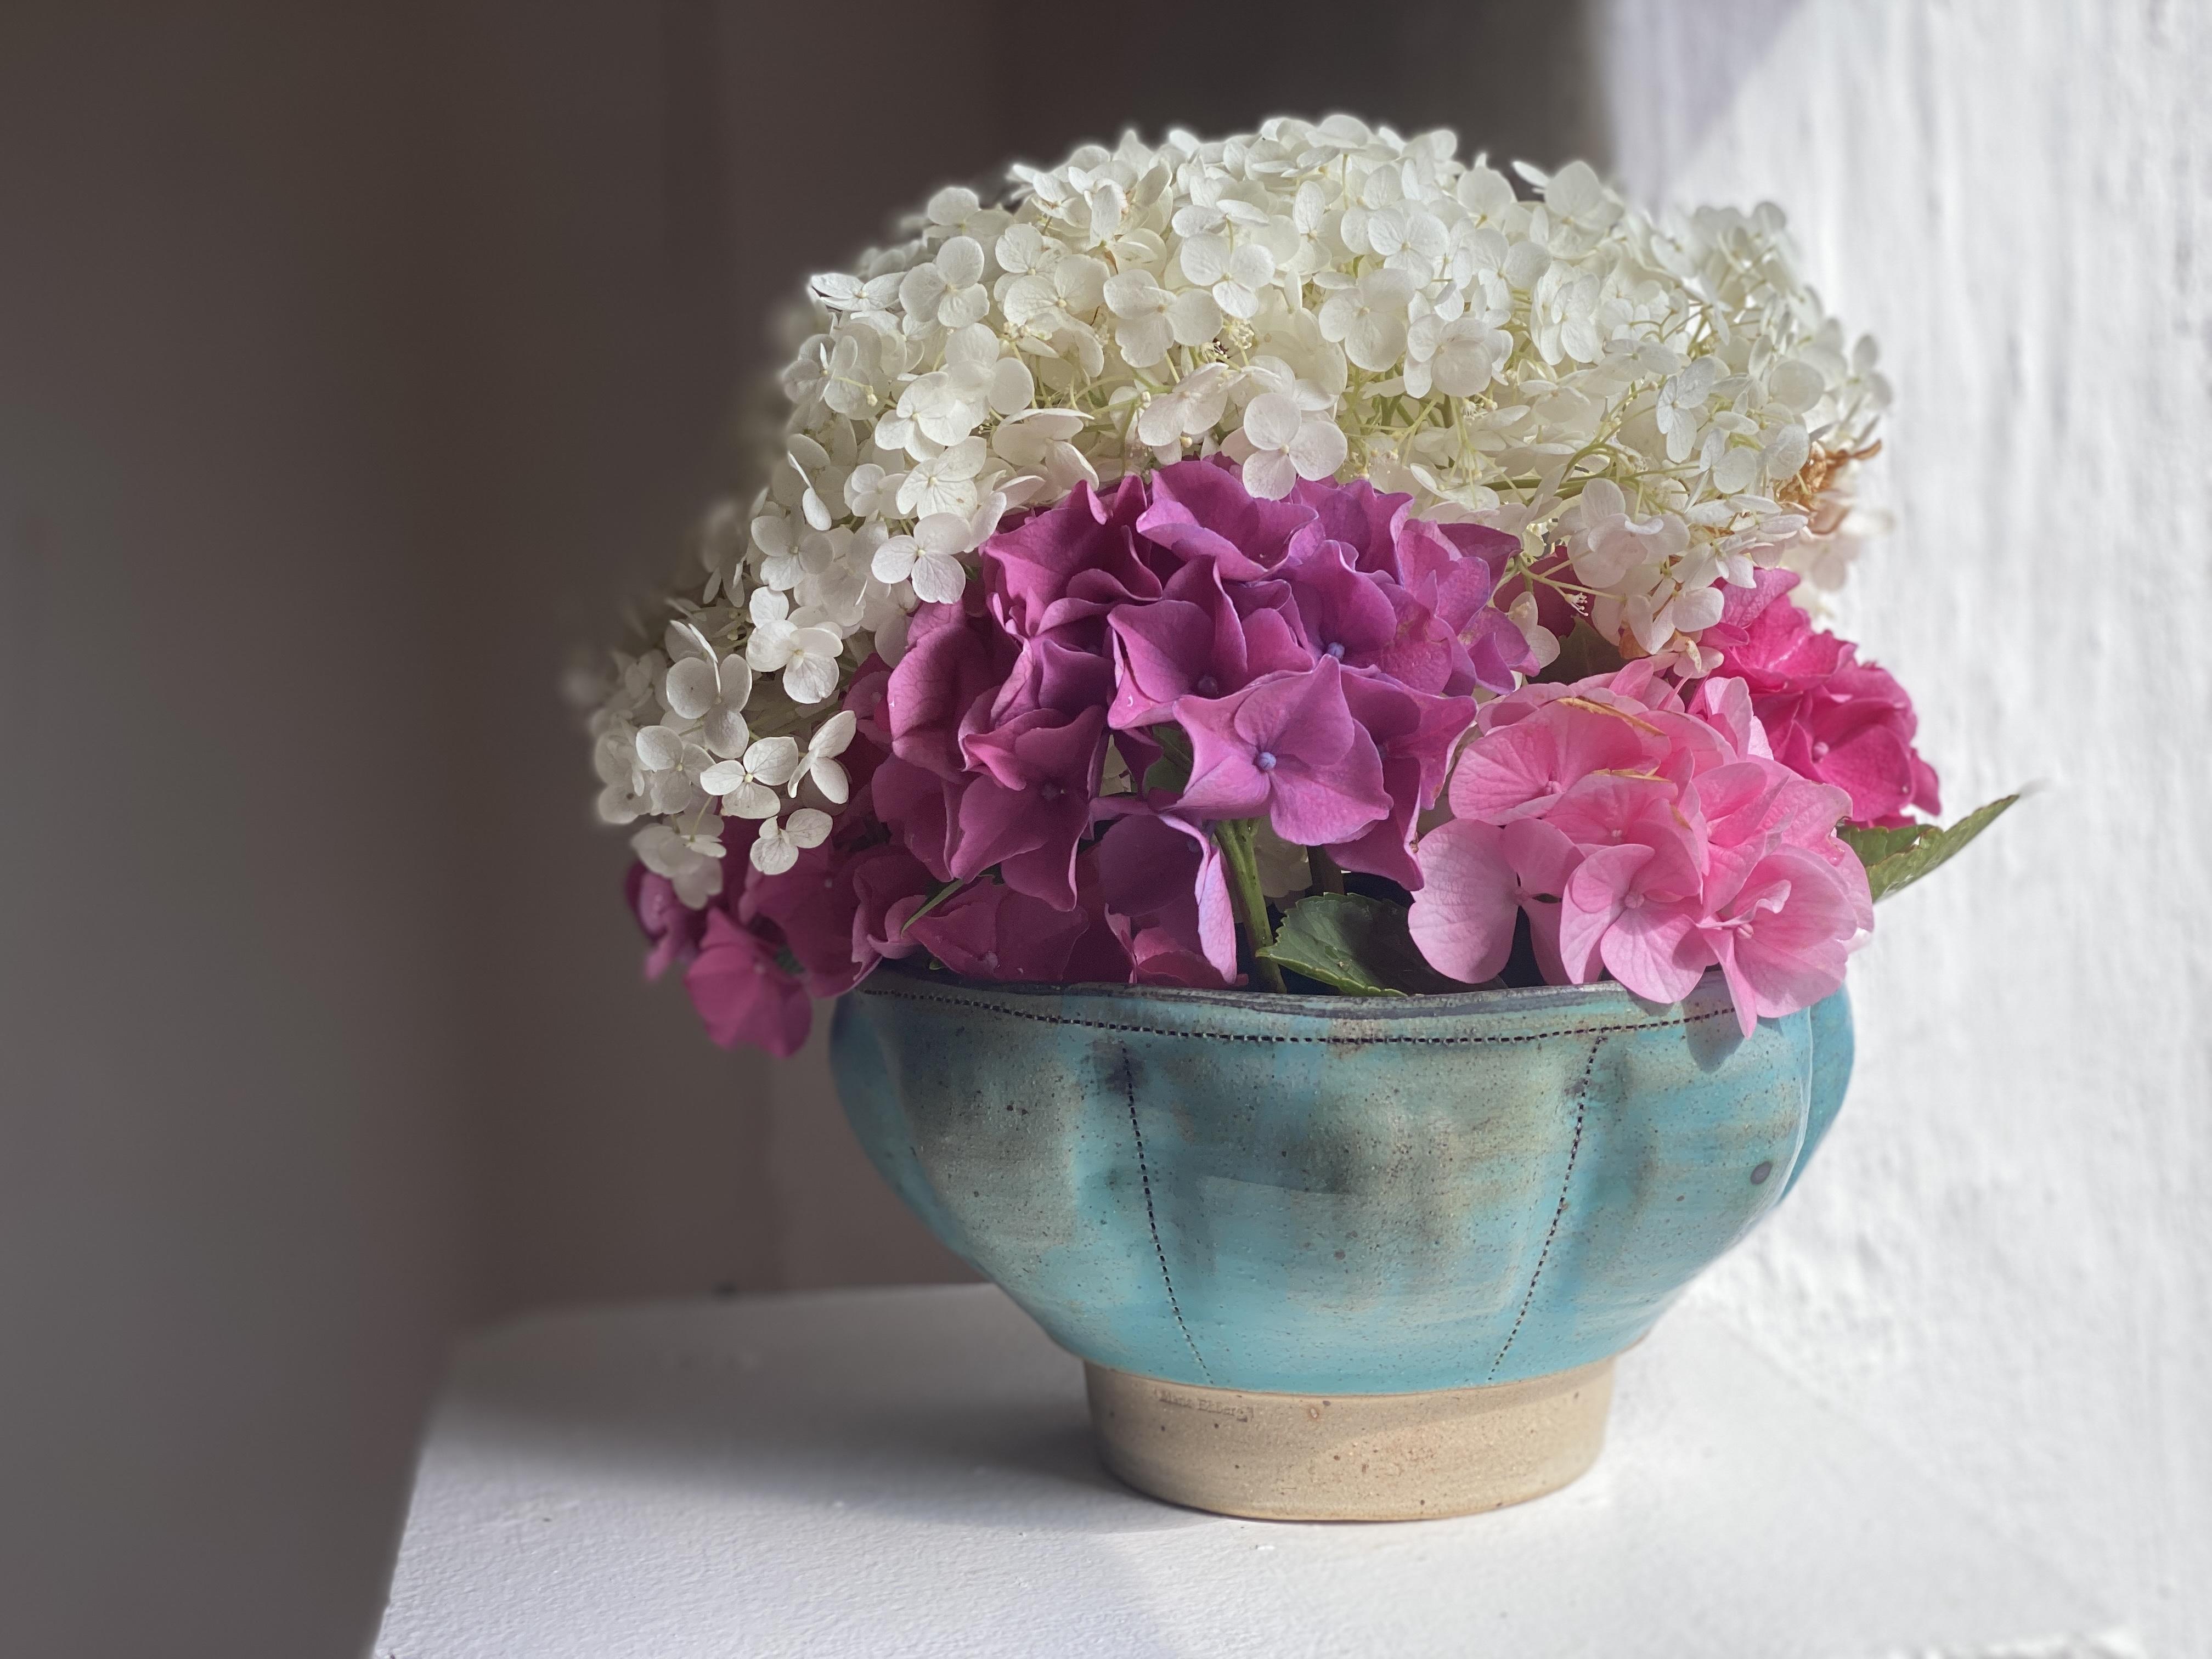 Blomsterskål